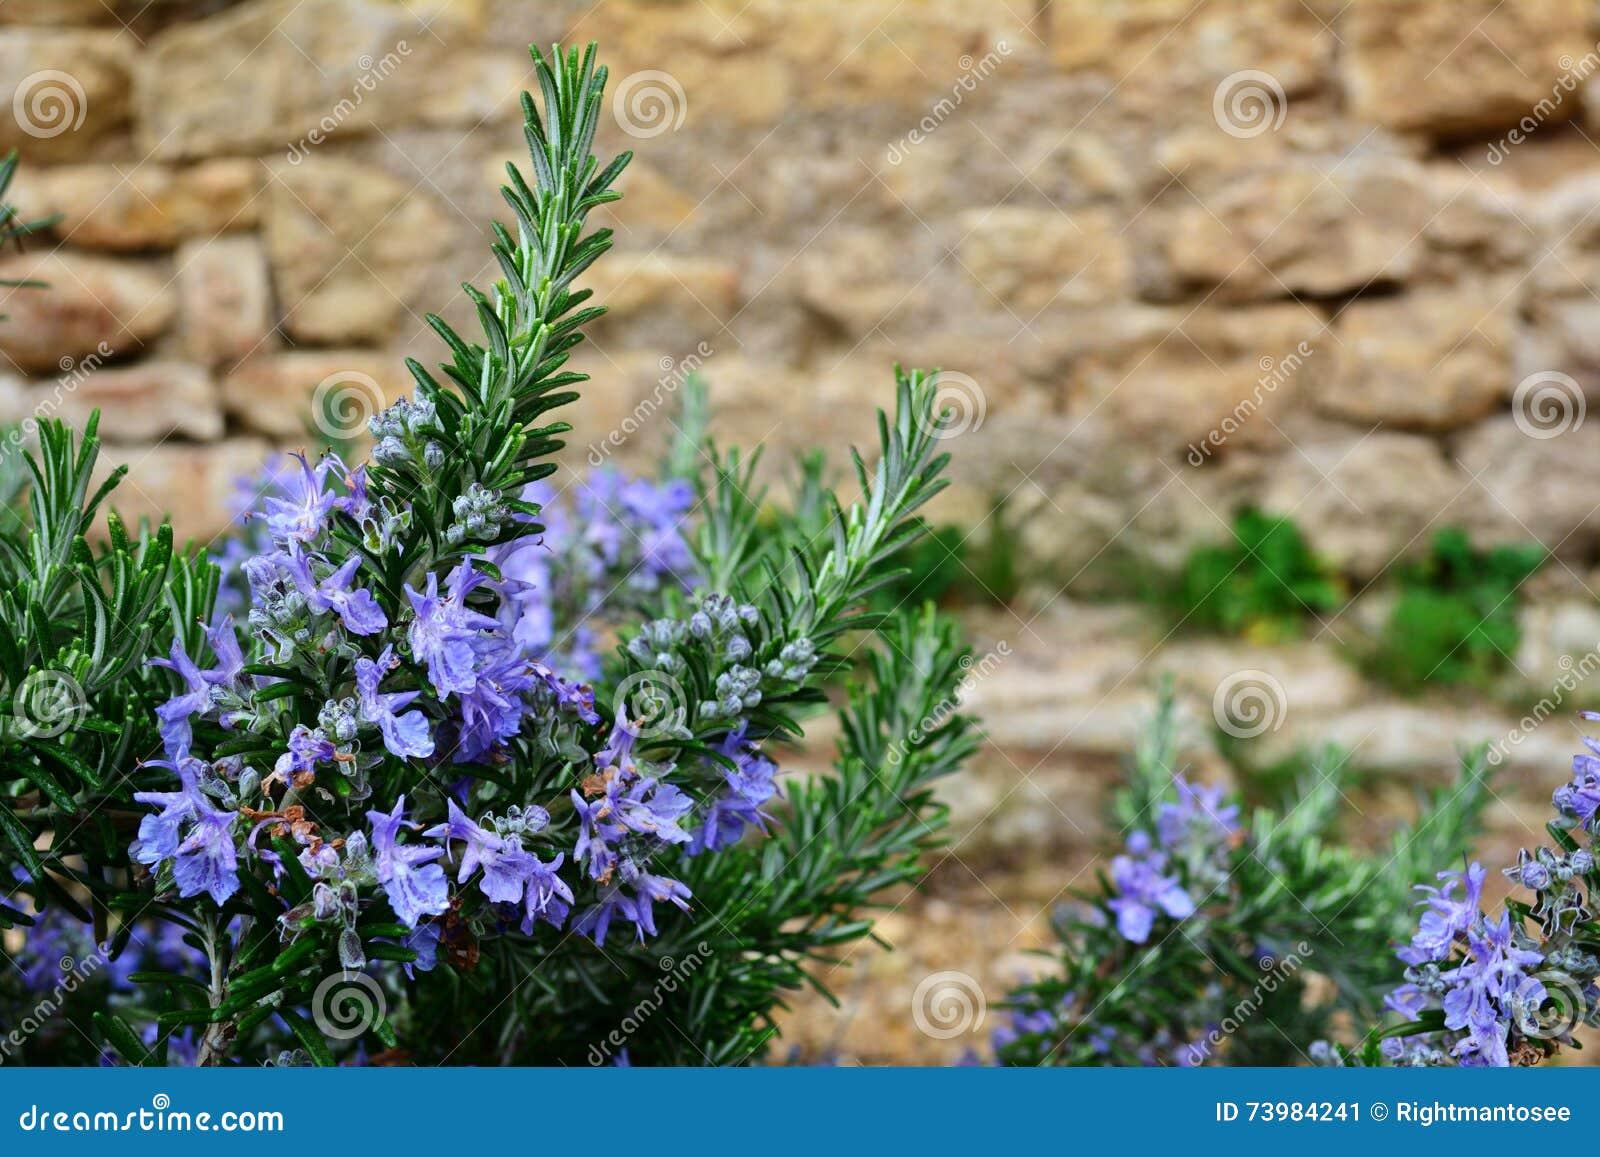 Rosemary With Blue Flowers Stock Image Image Of Freshness 73984241